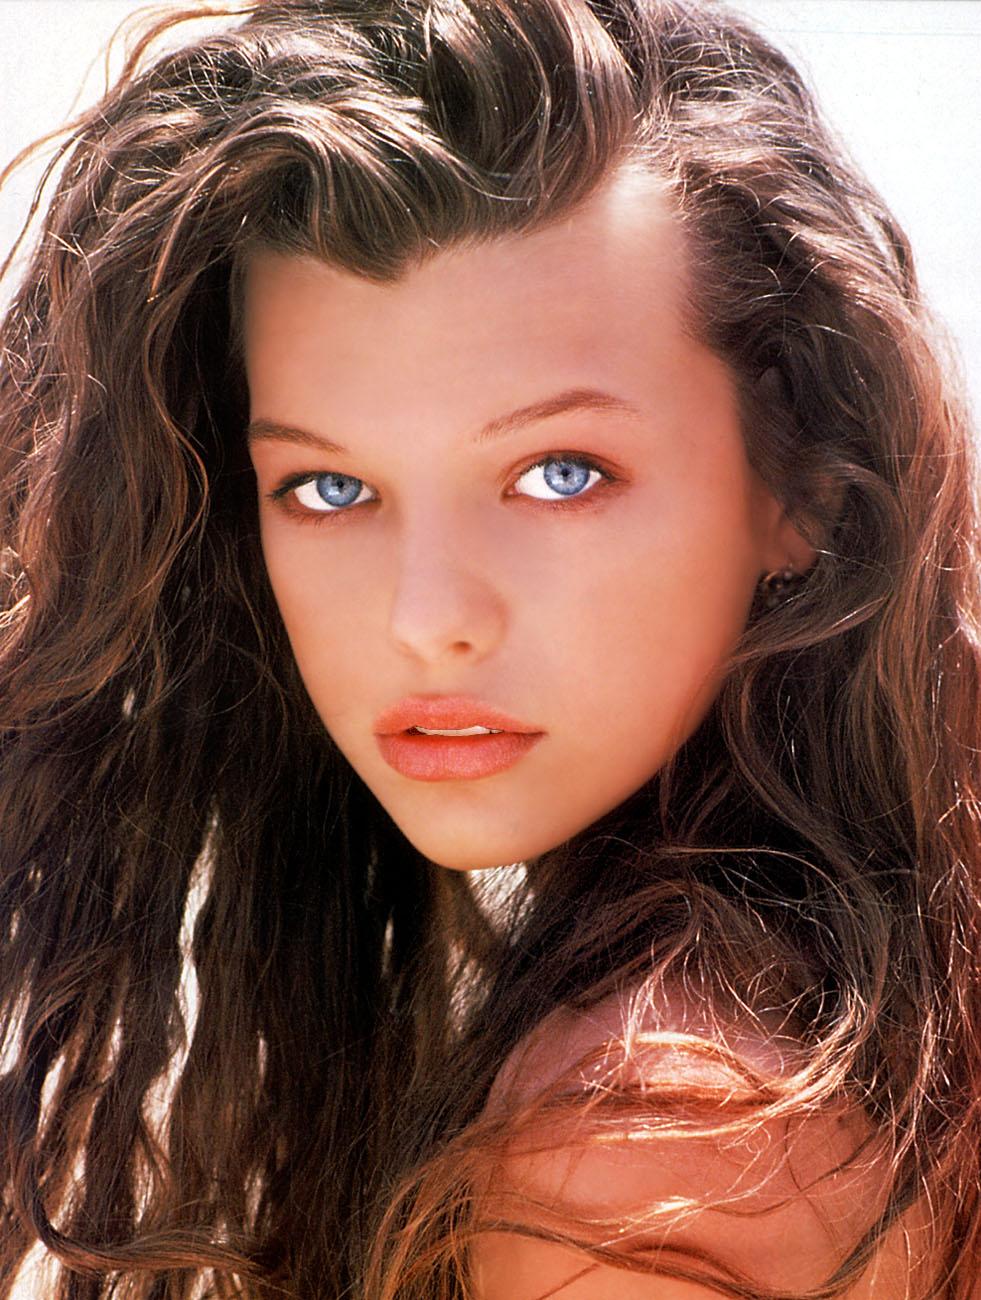 http://4.bp.blogspot.com/-9BD-rYDnKHU/TyFqOKjTX0I/AAAAAAAAKVM/OyH32jWQSVQ/s1600/Milla+Jovovich+%282%29.jpg